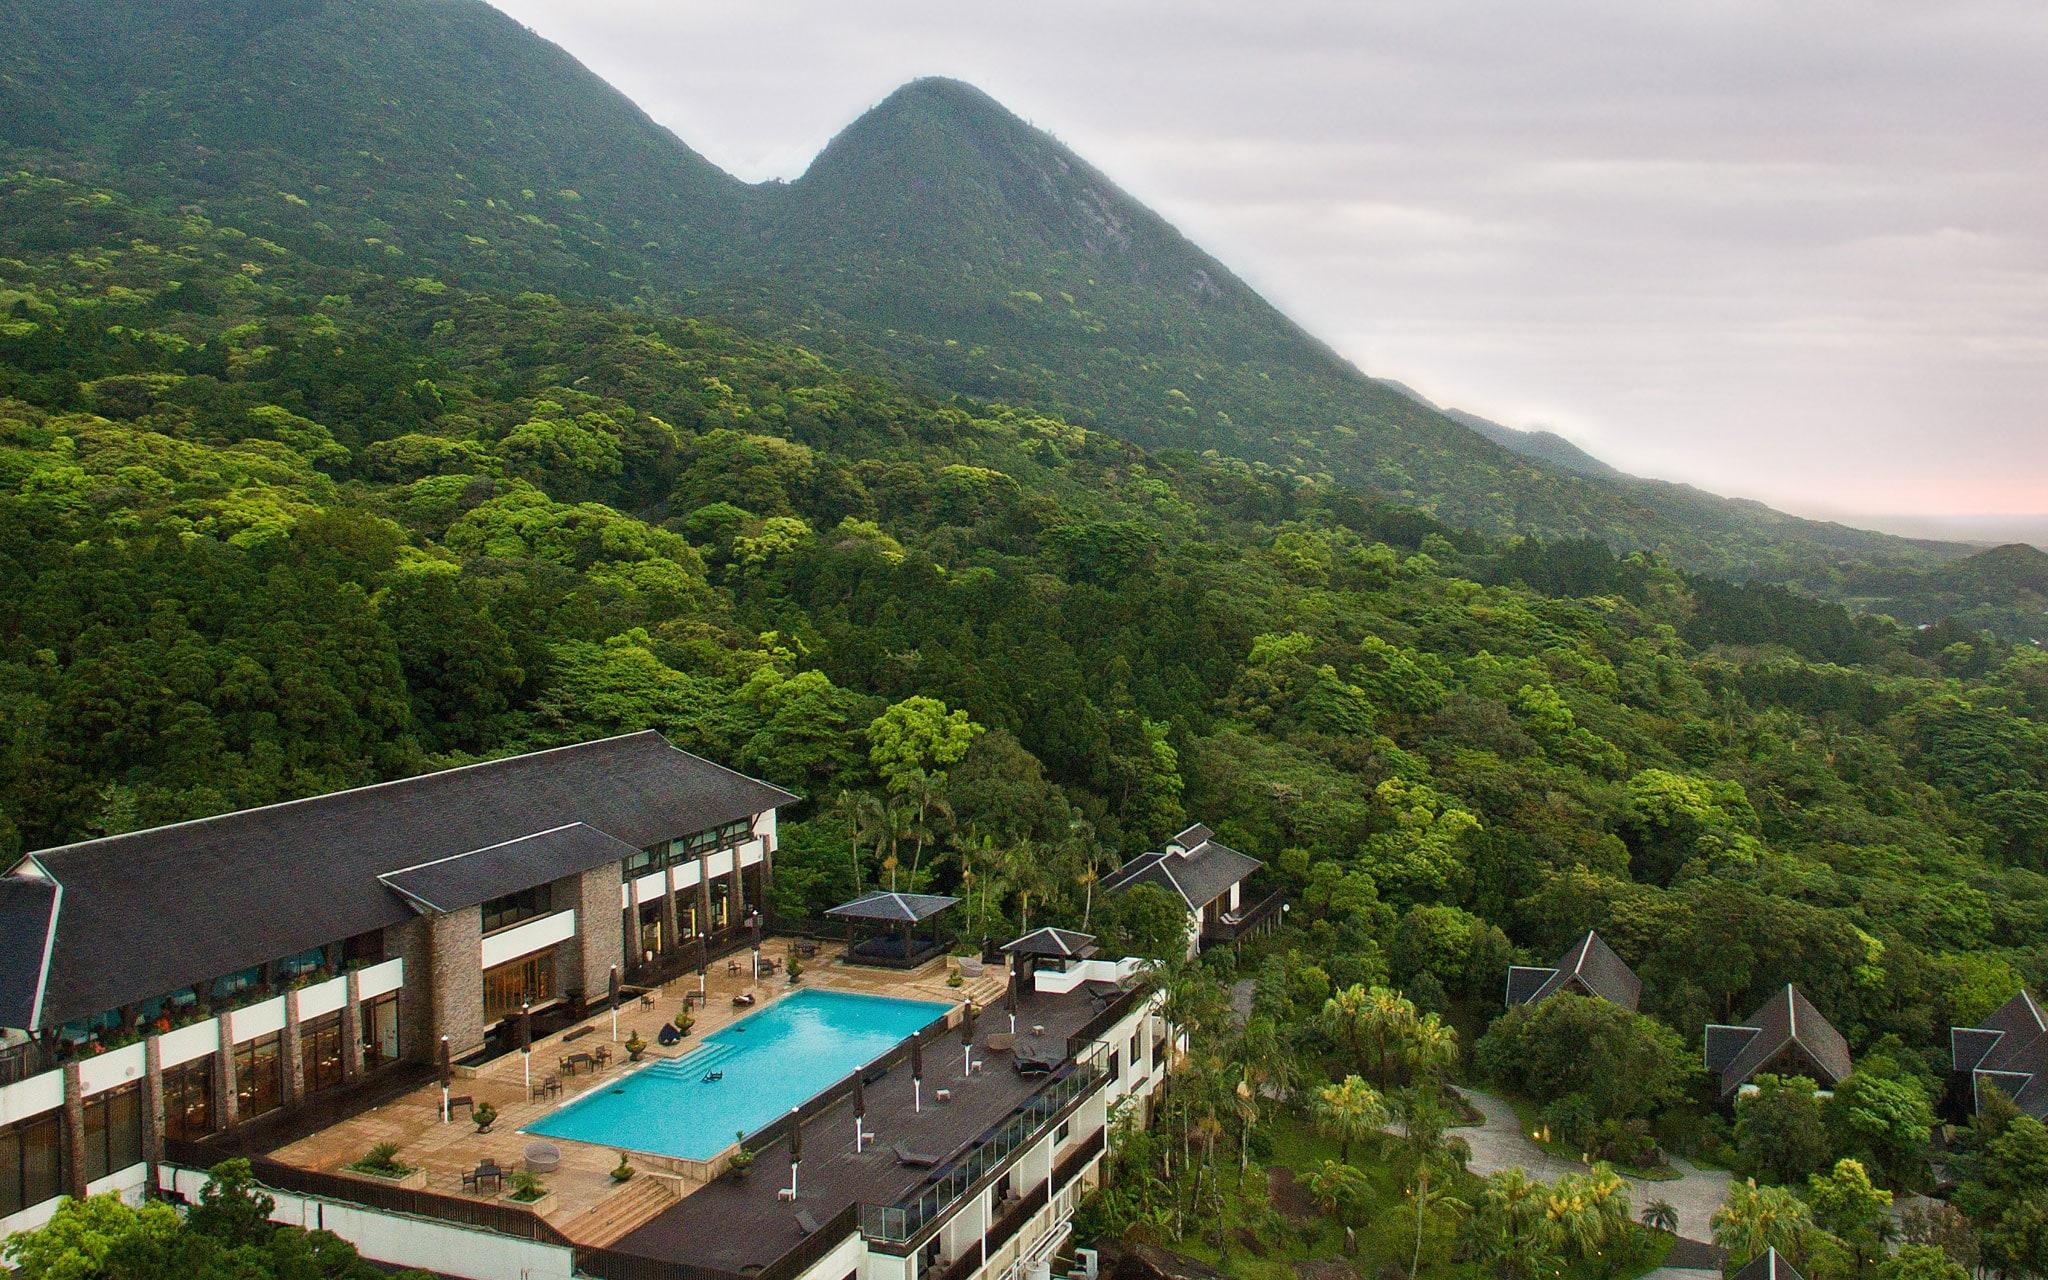 CREA Traveller WEBメンバー限定 <br />サンカラ ホテル&スパ 屋久島の <br />宿泊券を1組様に